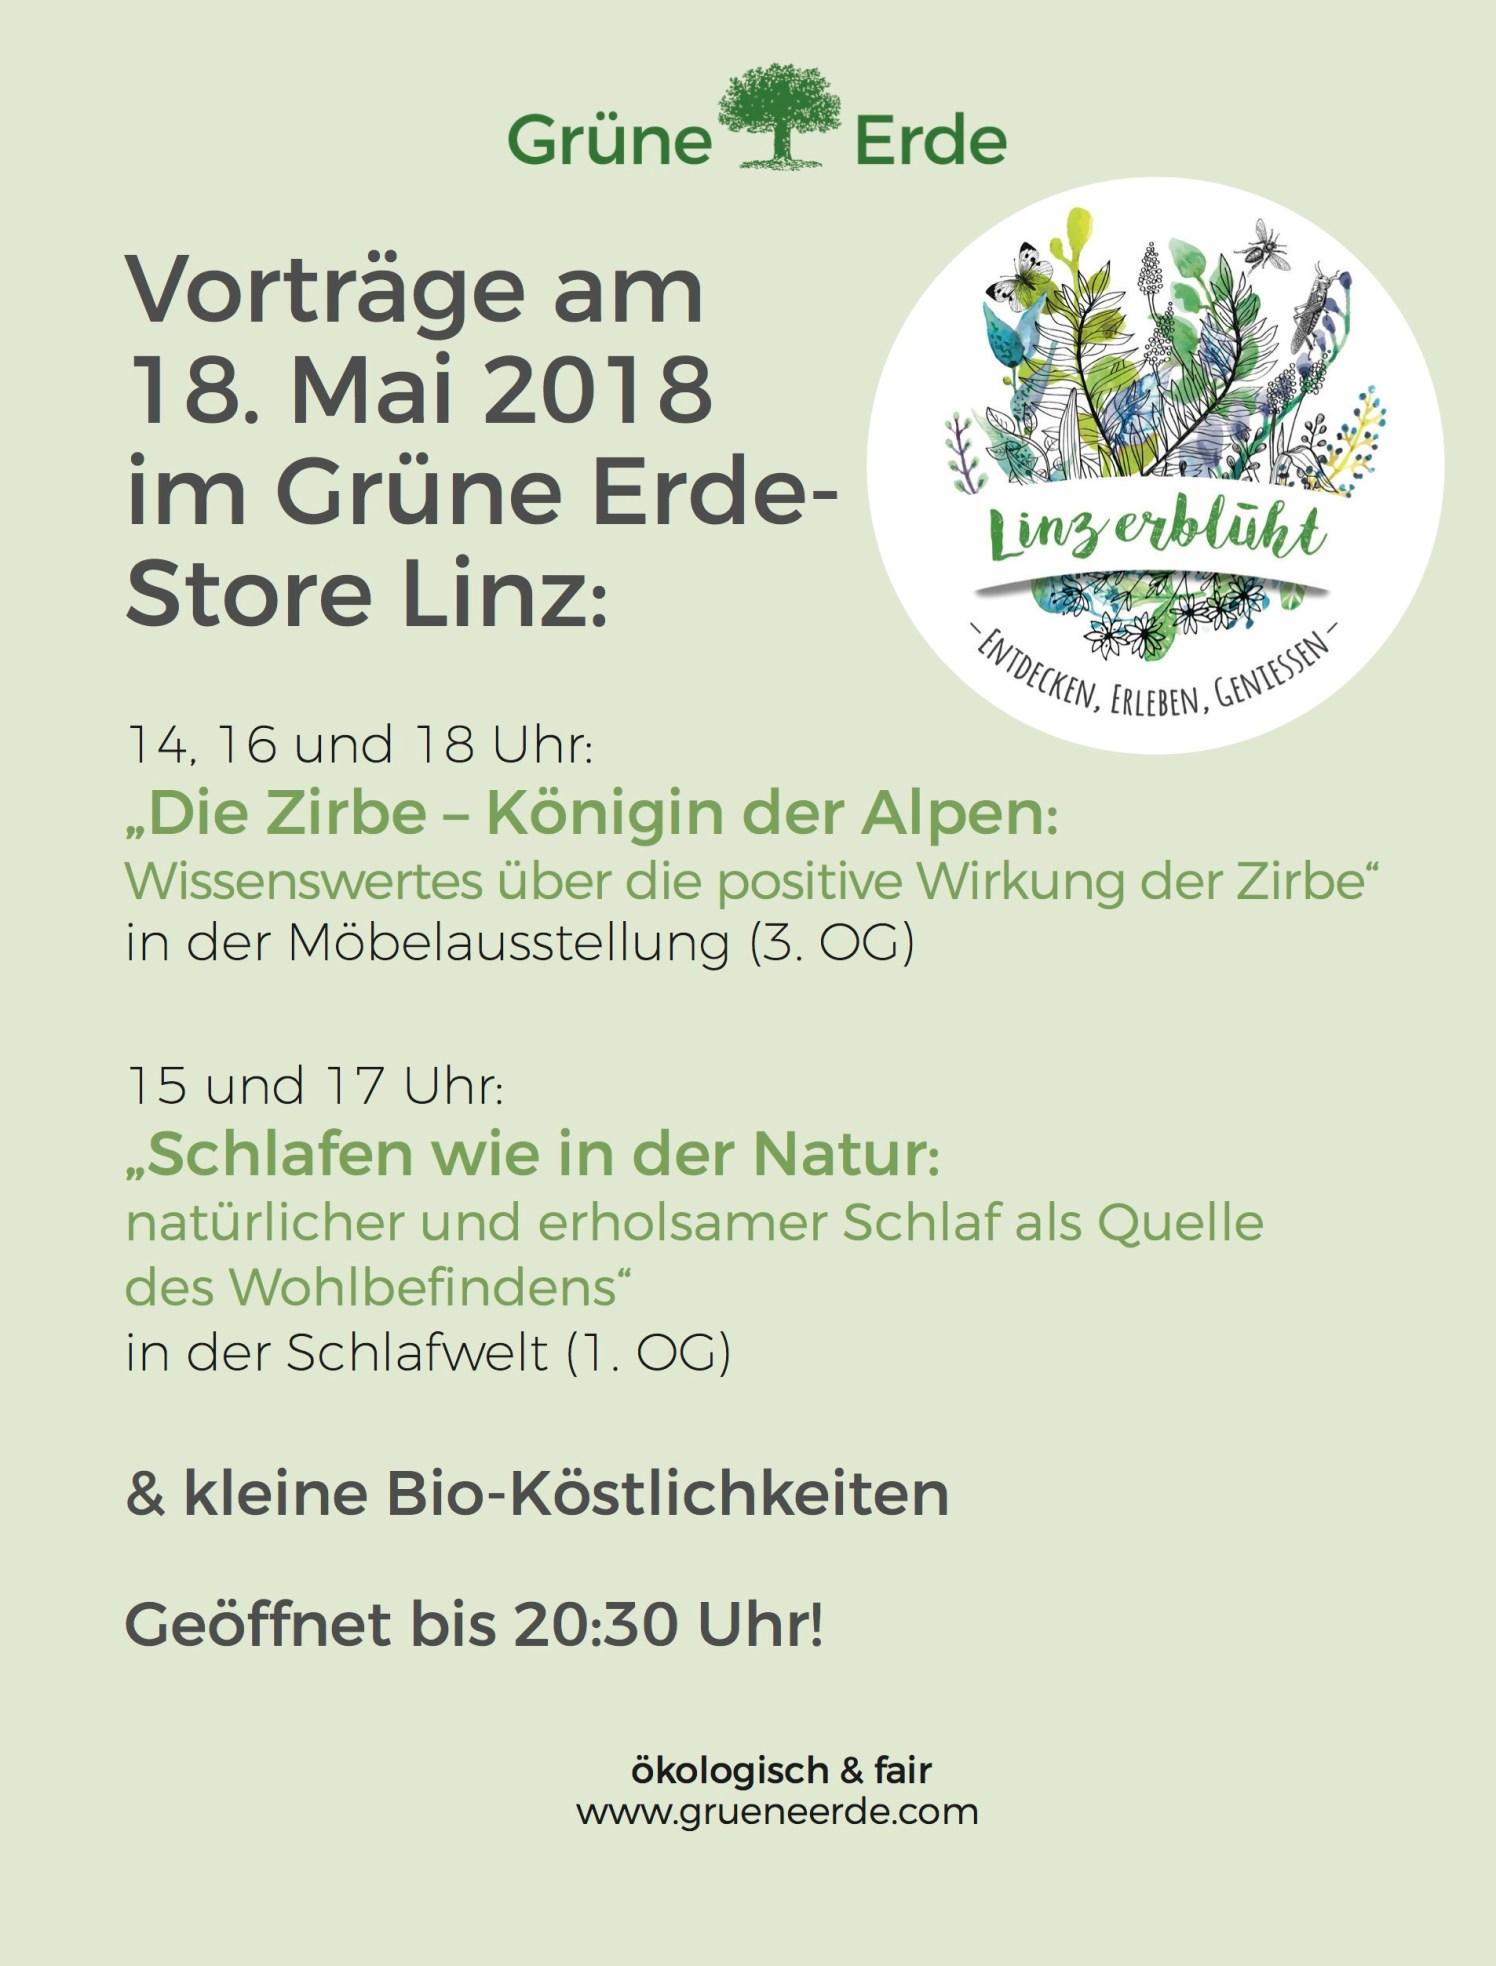 Gruene Erde - Vortraege am 18.05.2018